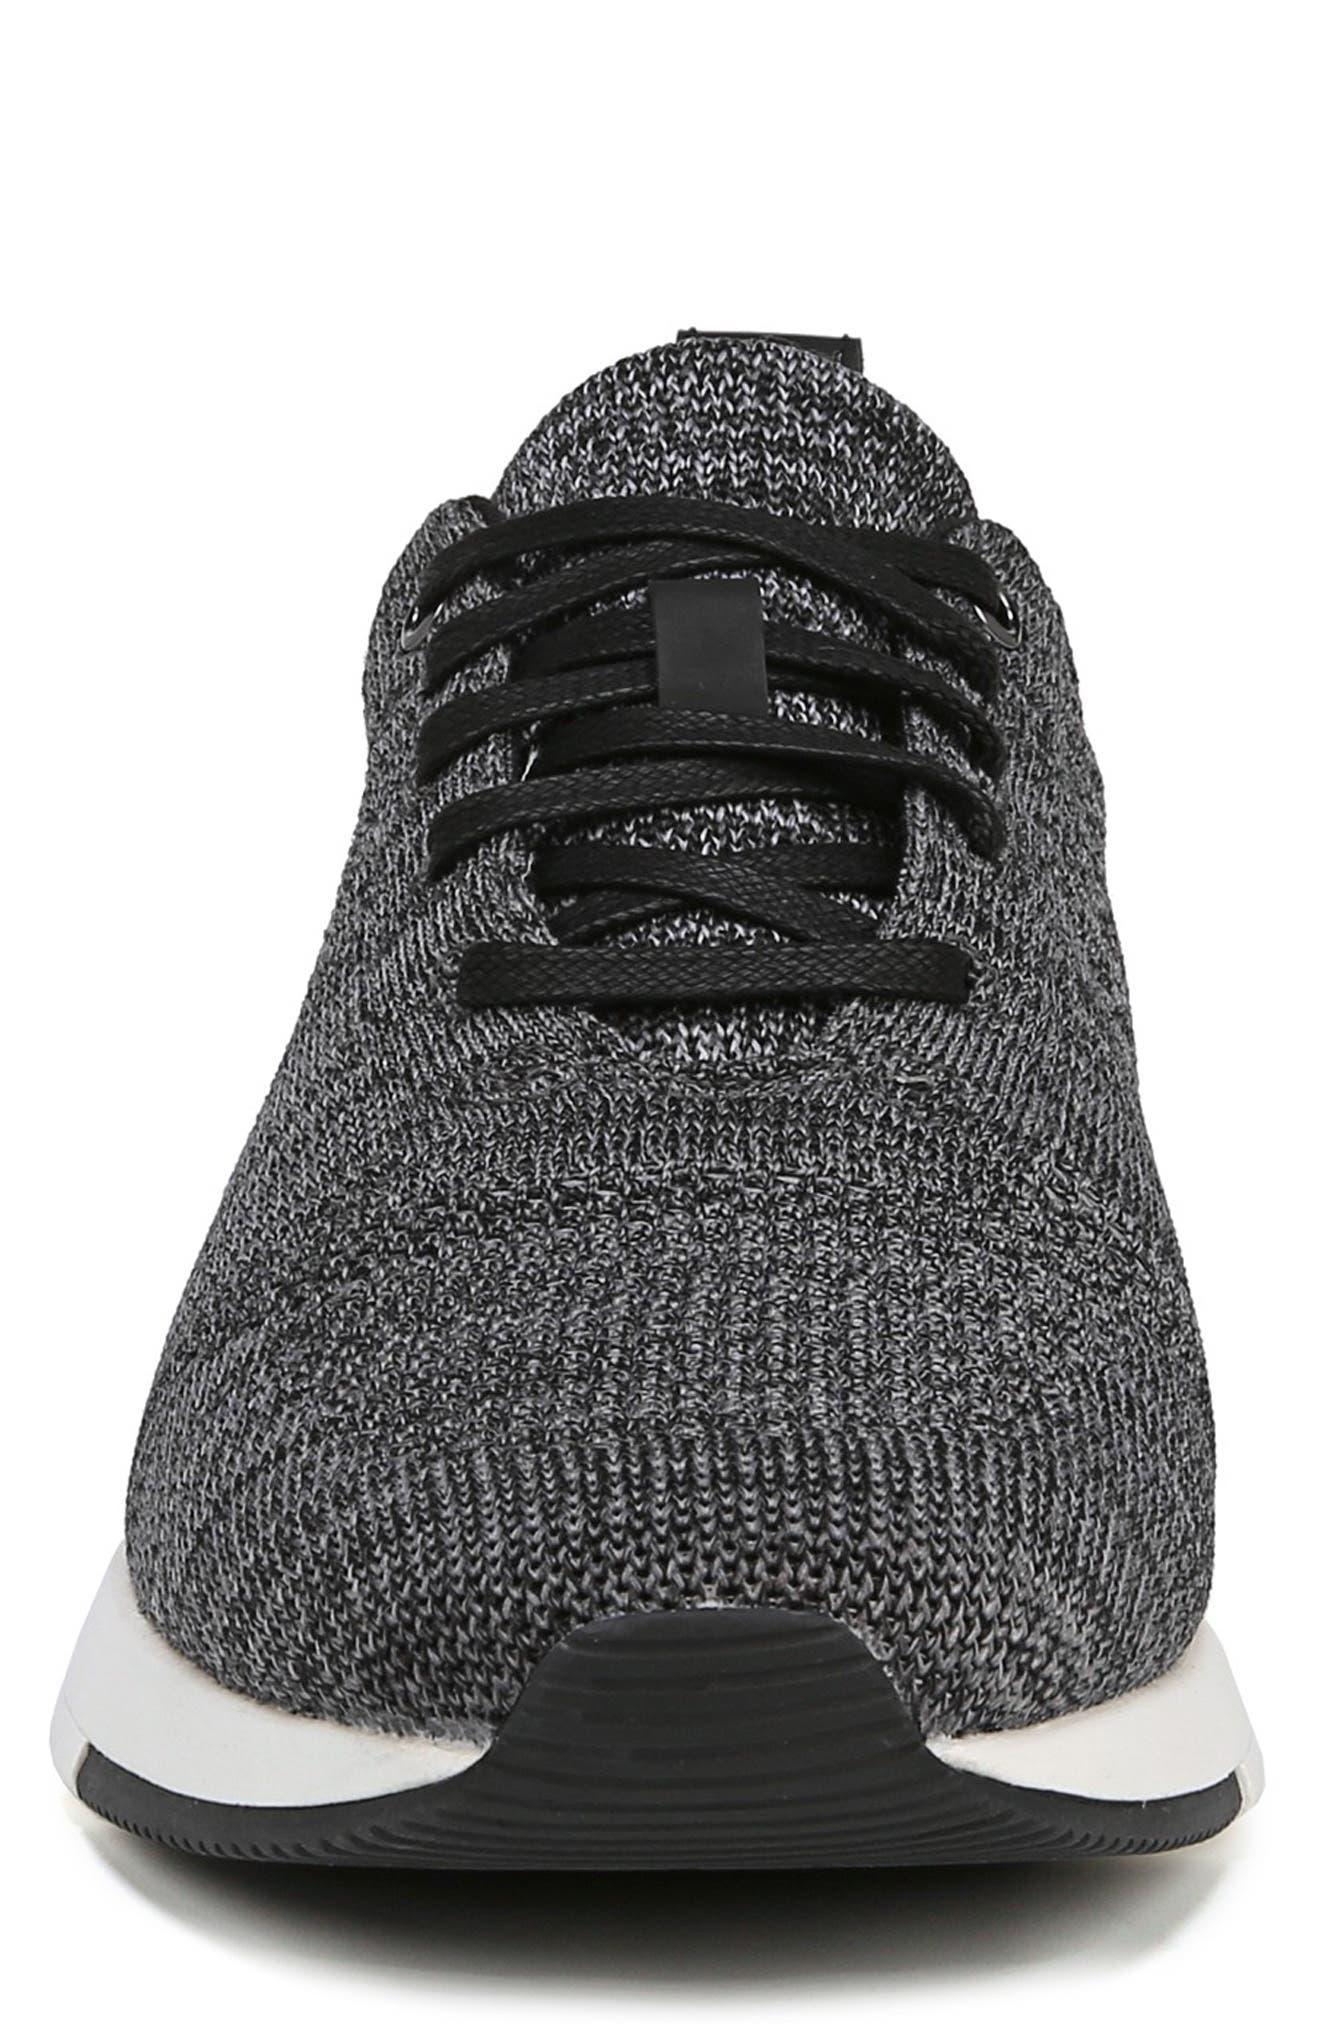 Palo Knit Sneaker,                             Alternate thumbnail 4, color,                             MARL GREY/ BLACK